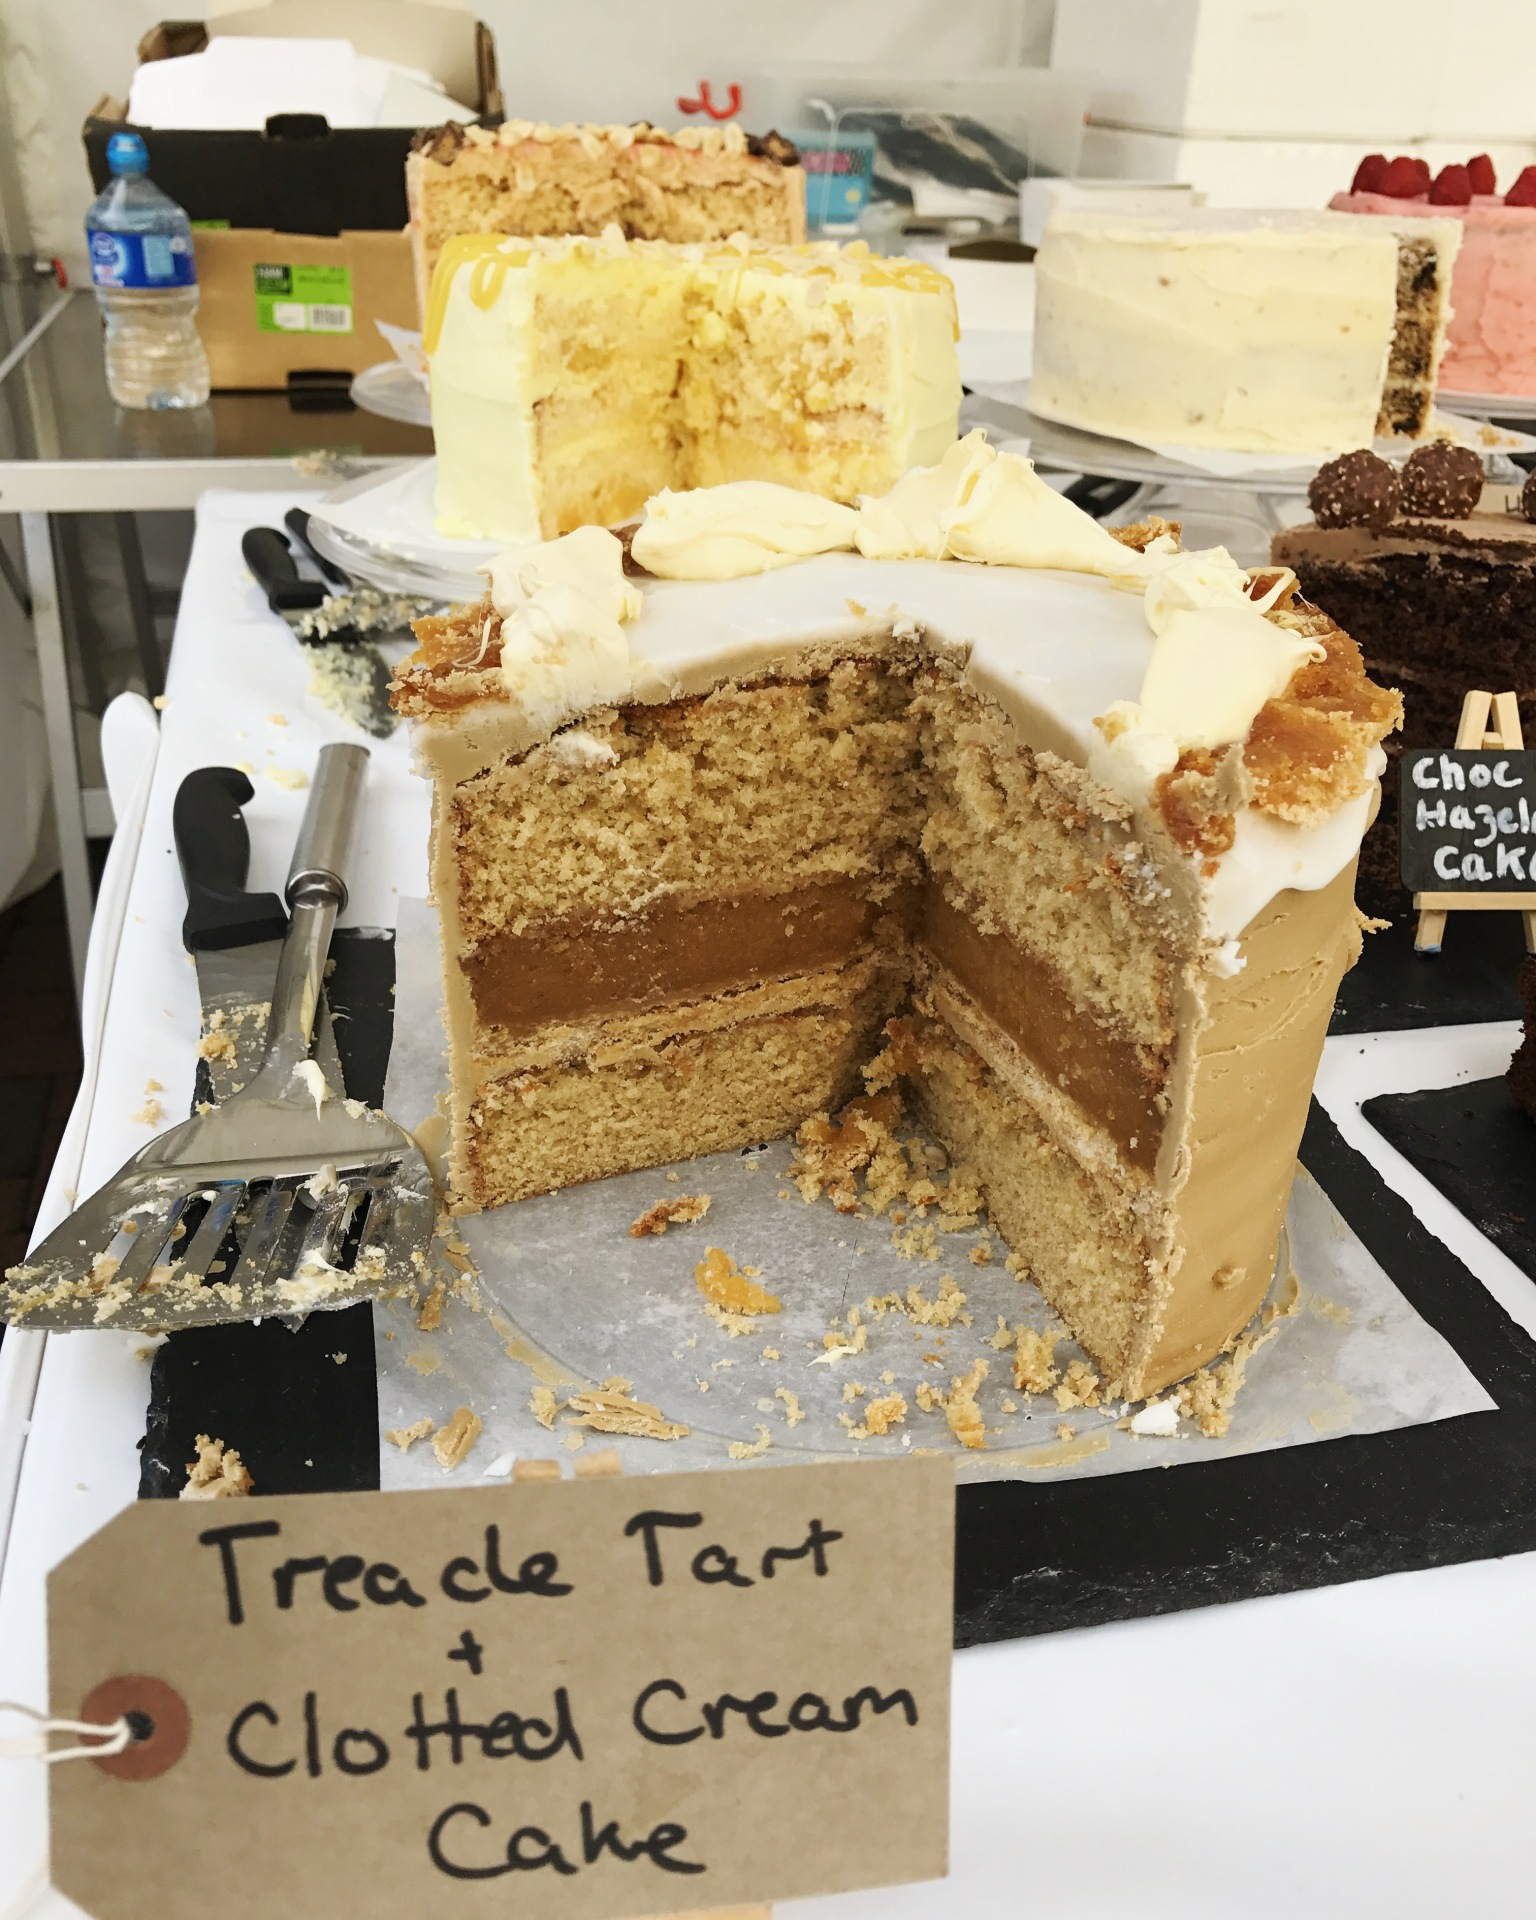 Treacle Tart & Clotted Cream Cake